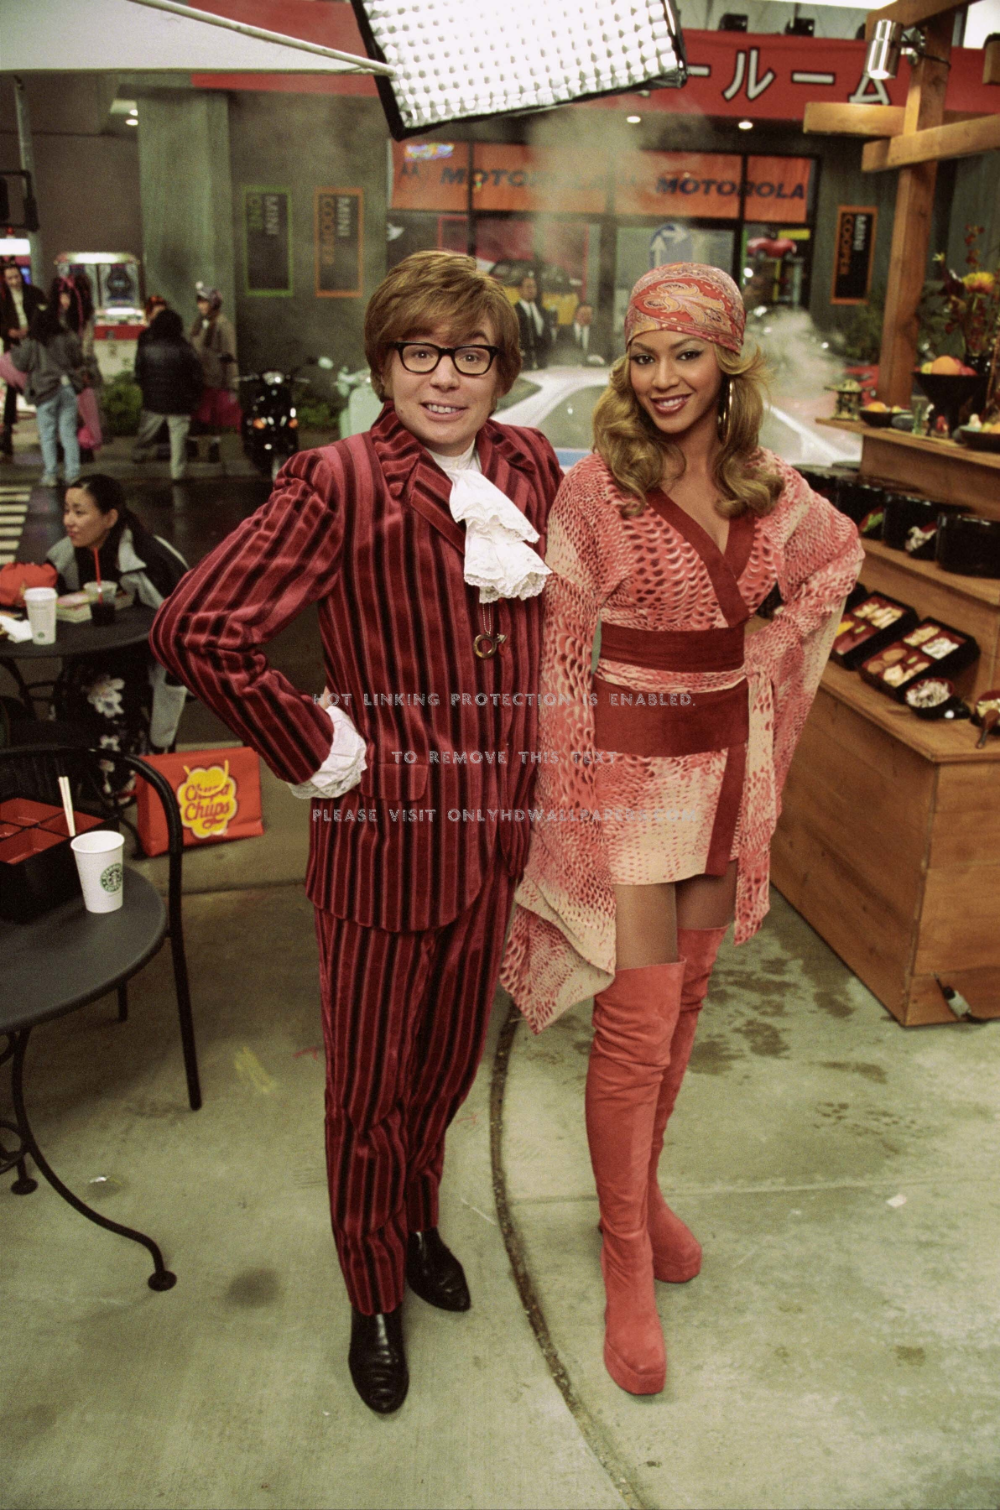 Austin Powers Wallpaper Hd Wallpapers Backgrounds Disco Outfit Austin Powers Costume Austin Powers